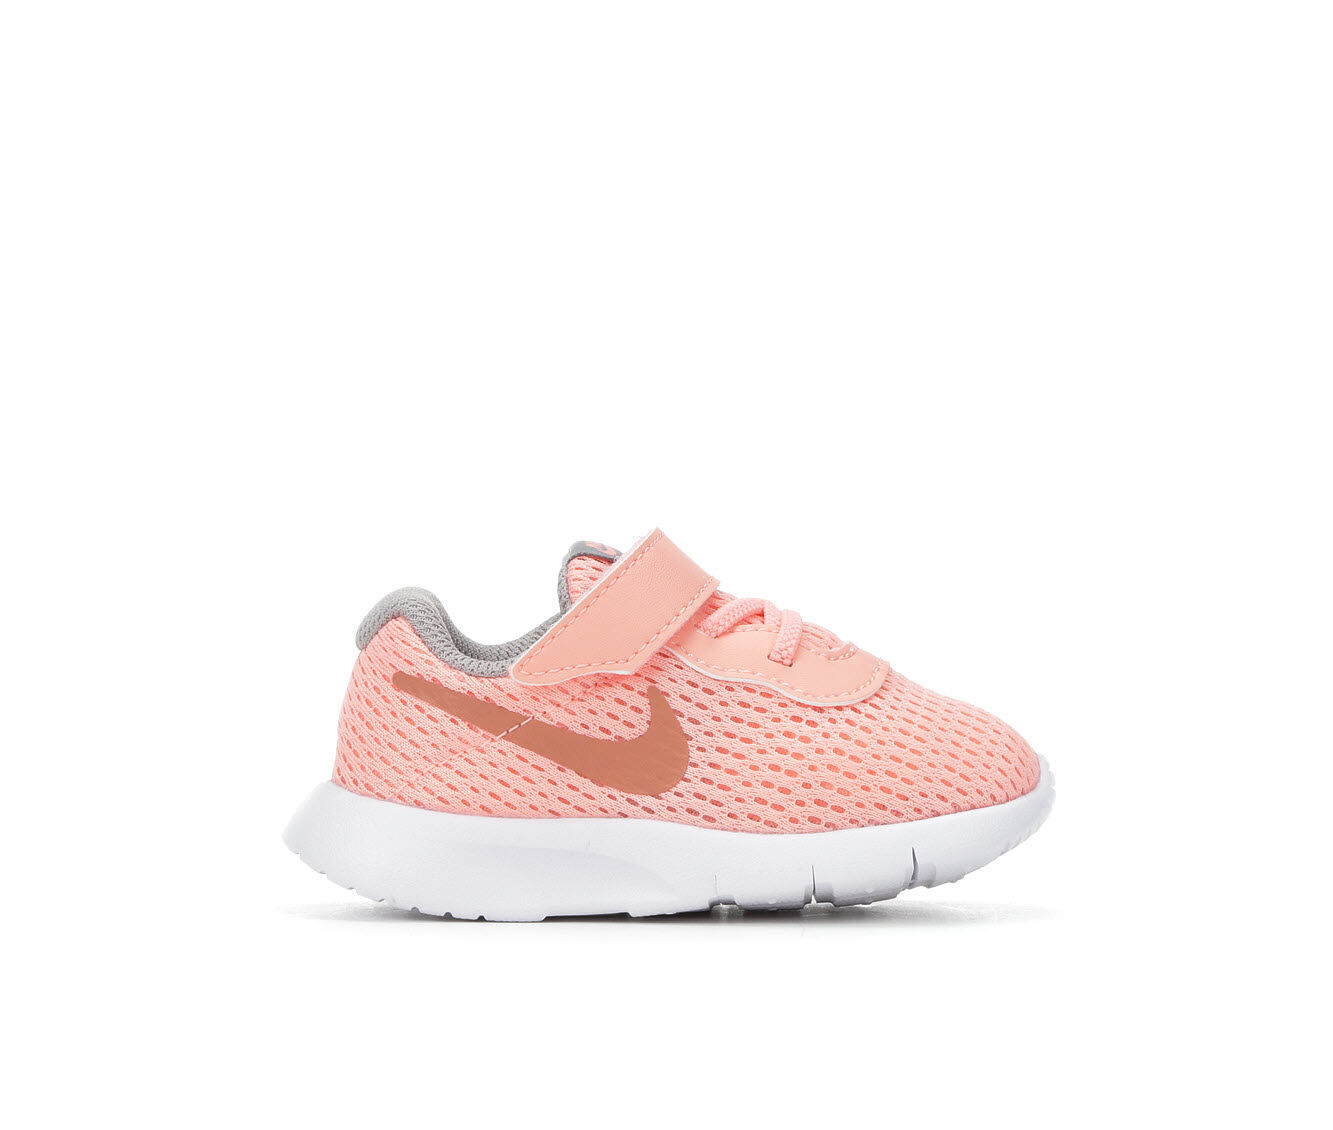 Girls' Nike Infant & Toddler Tanjun Sneakers